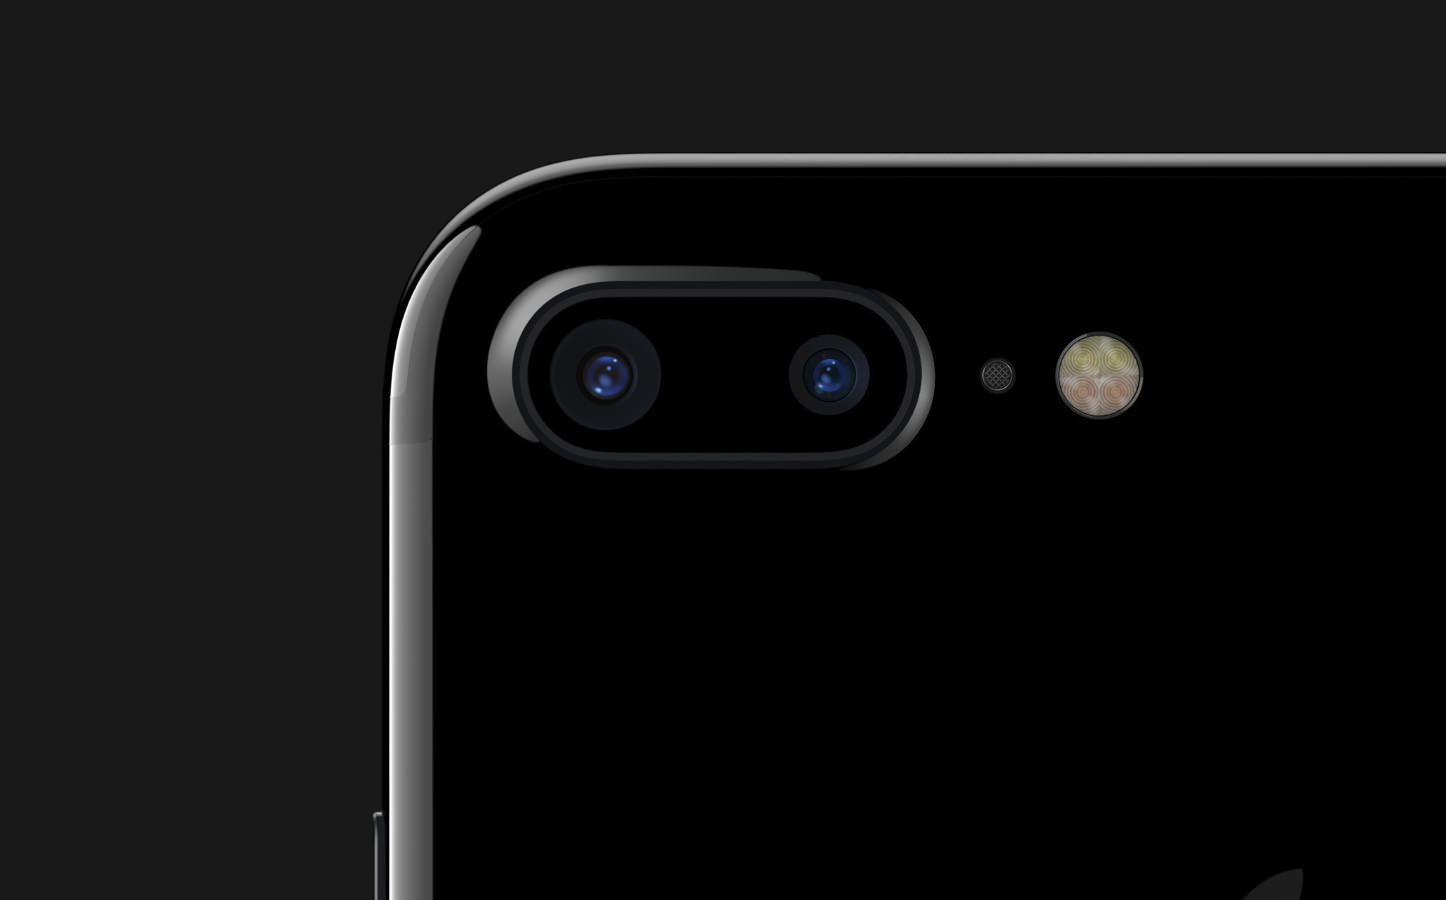 Iphone7 dual lens camera